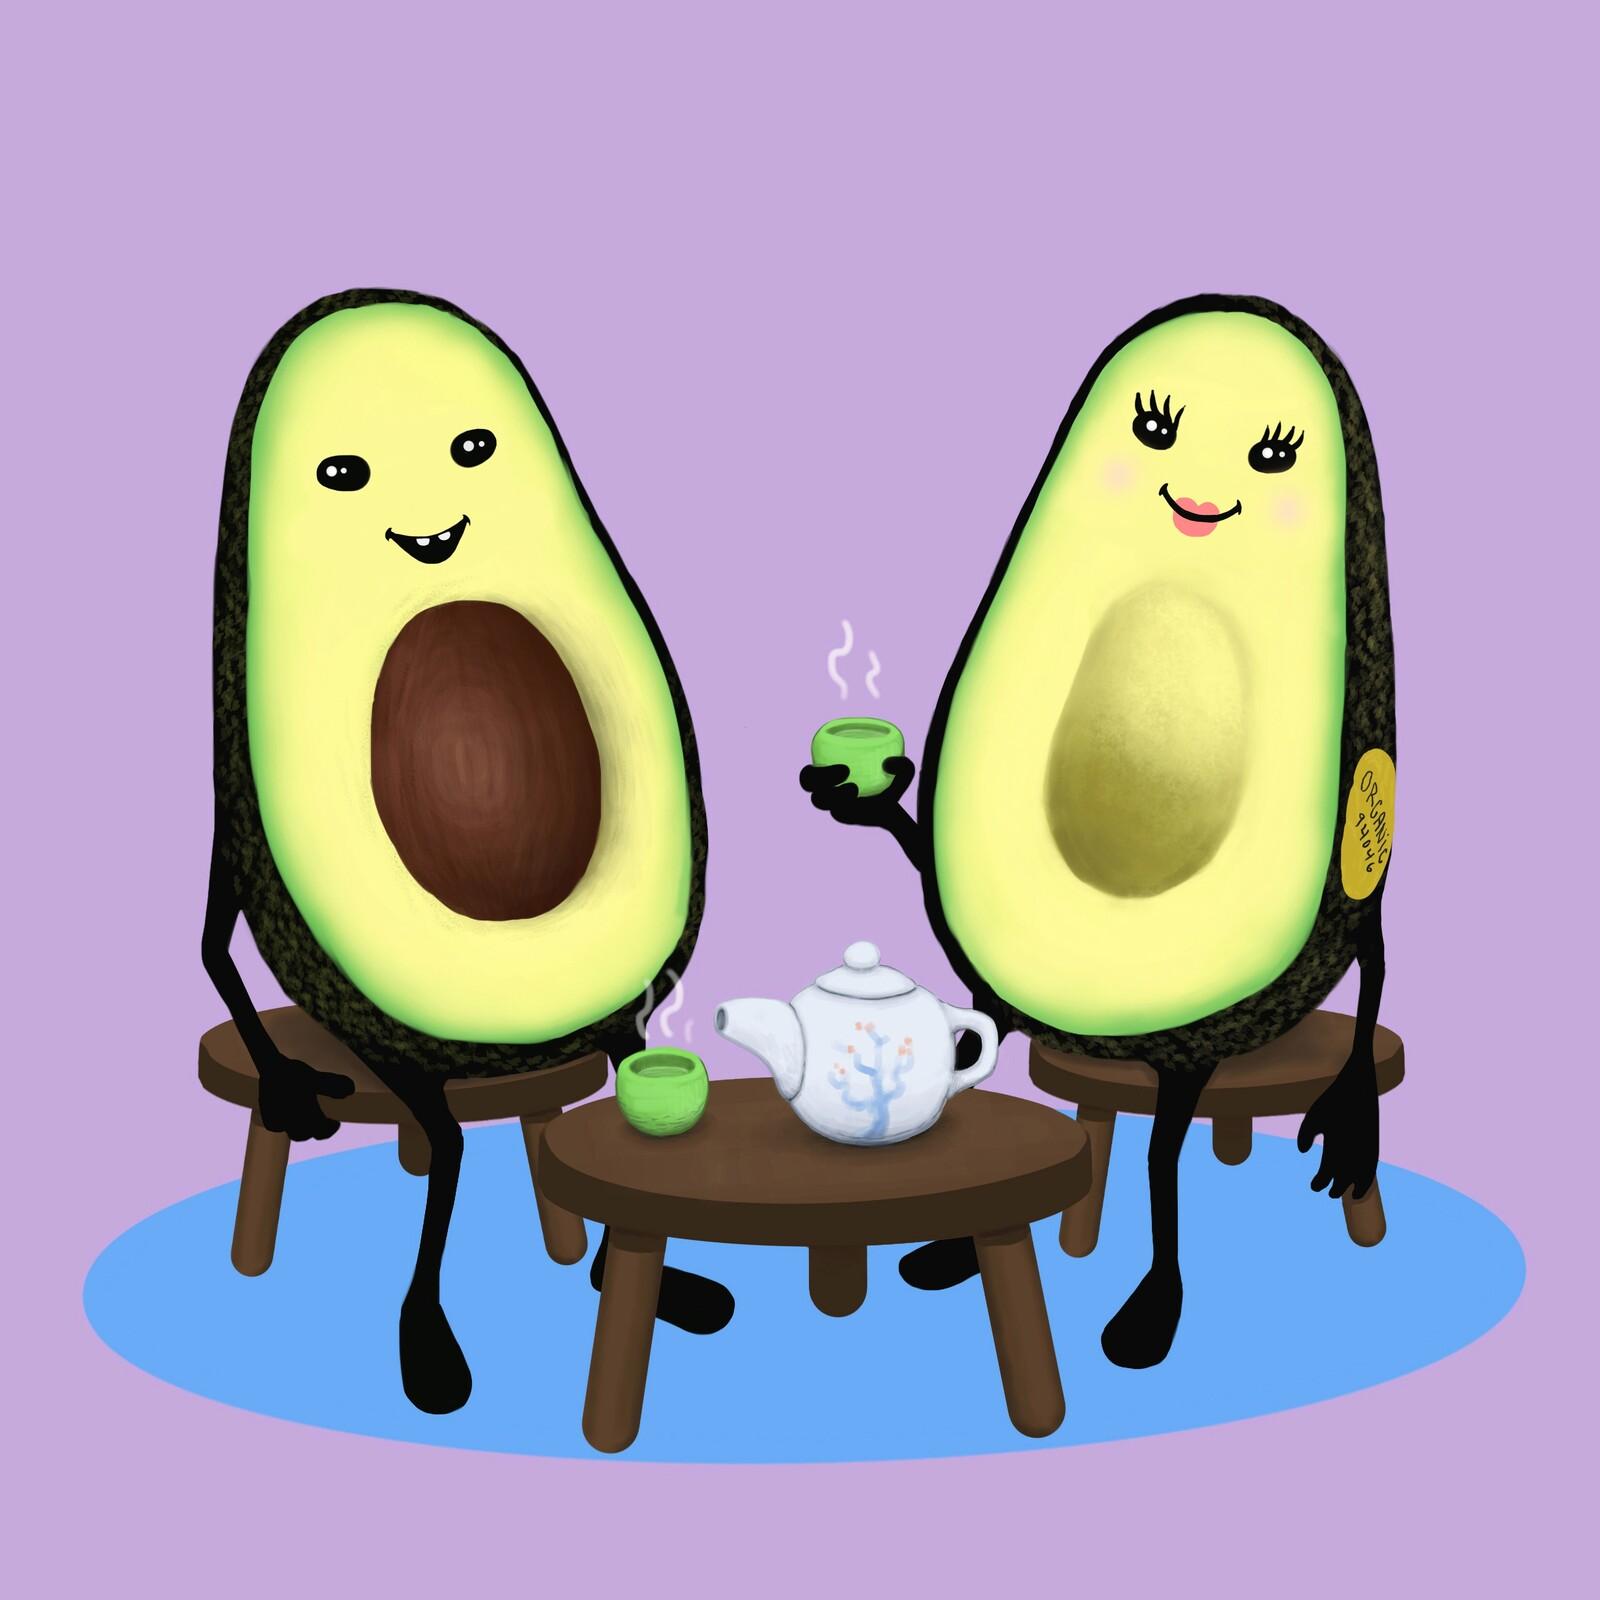 Mike & Mindy Avocado